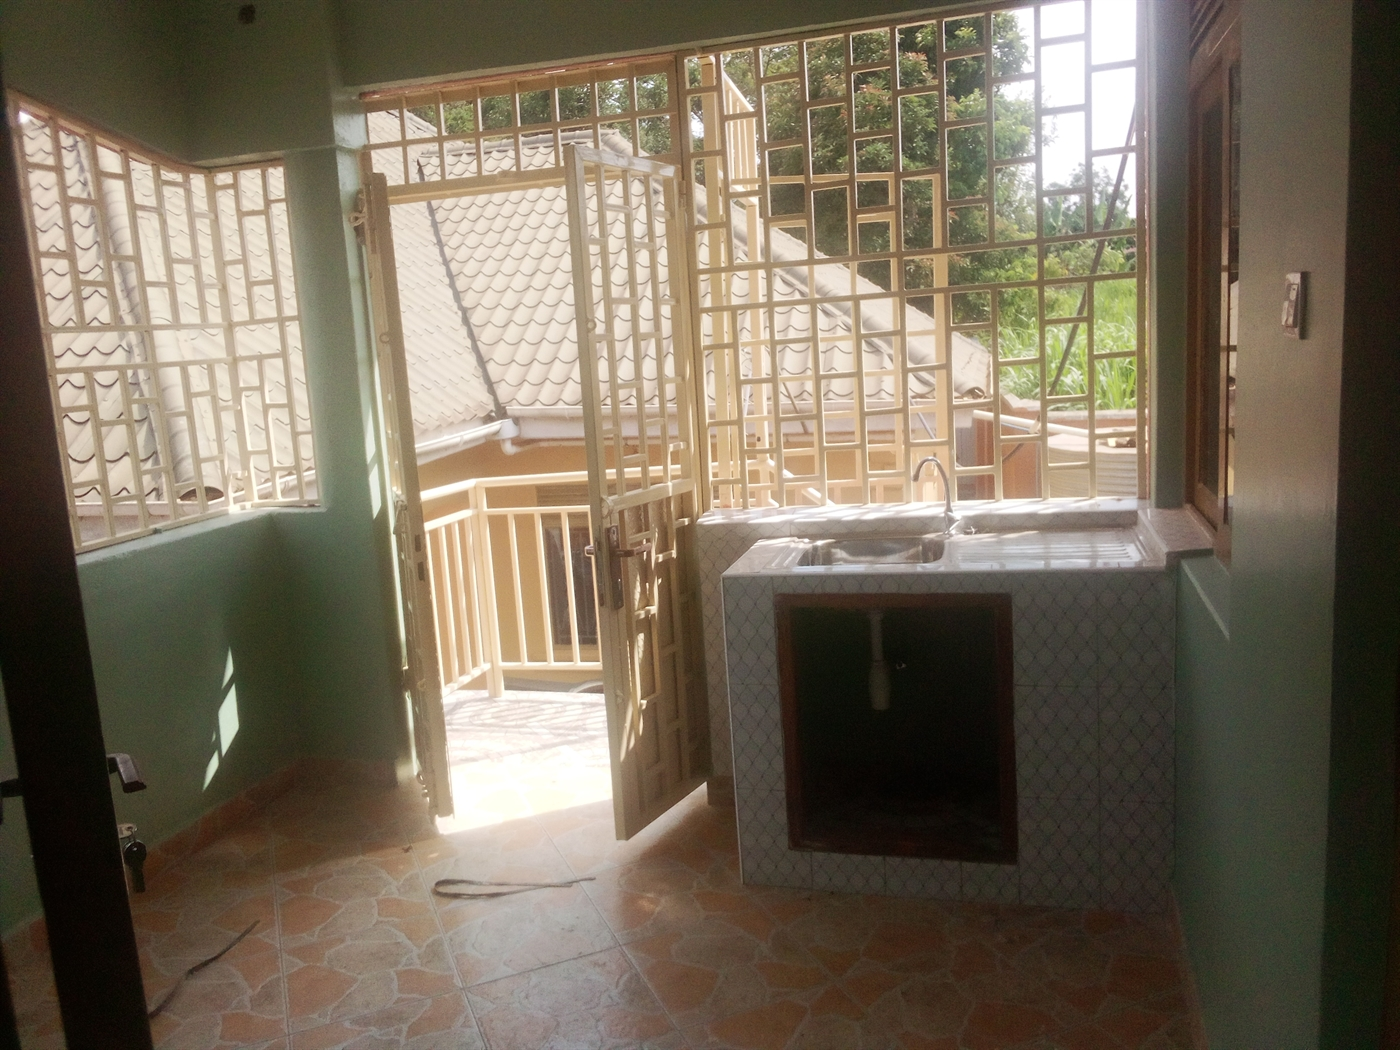 Apartment for rent in Kiteetikka Kampala